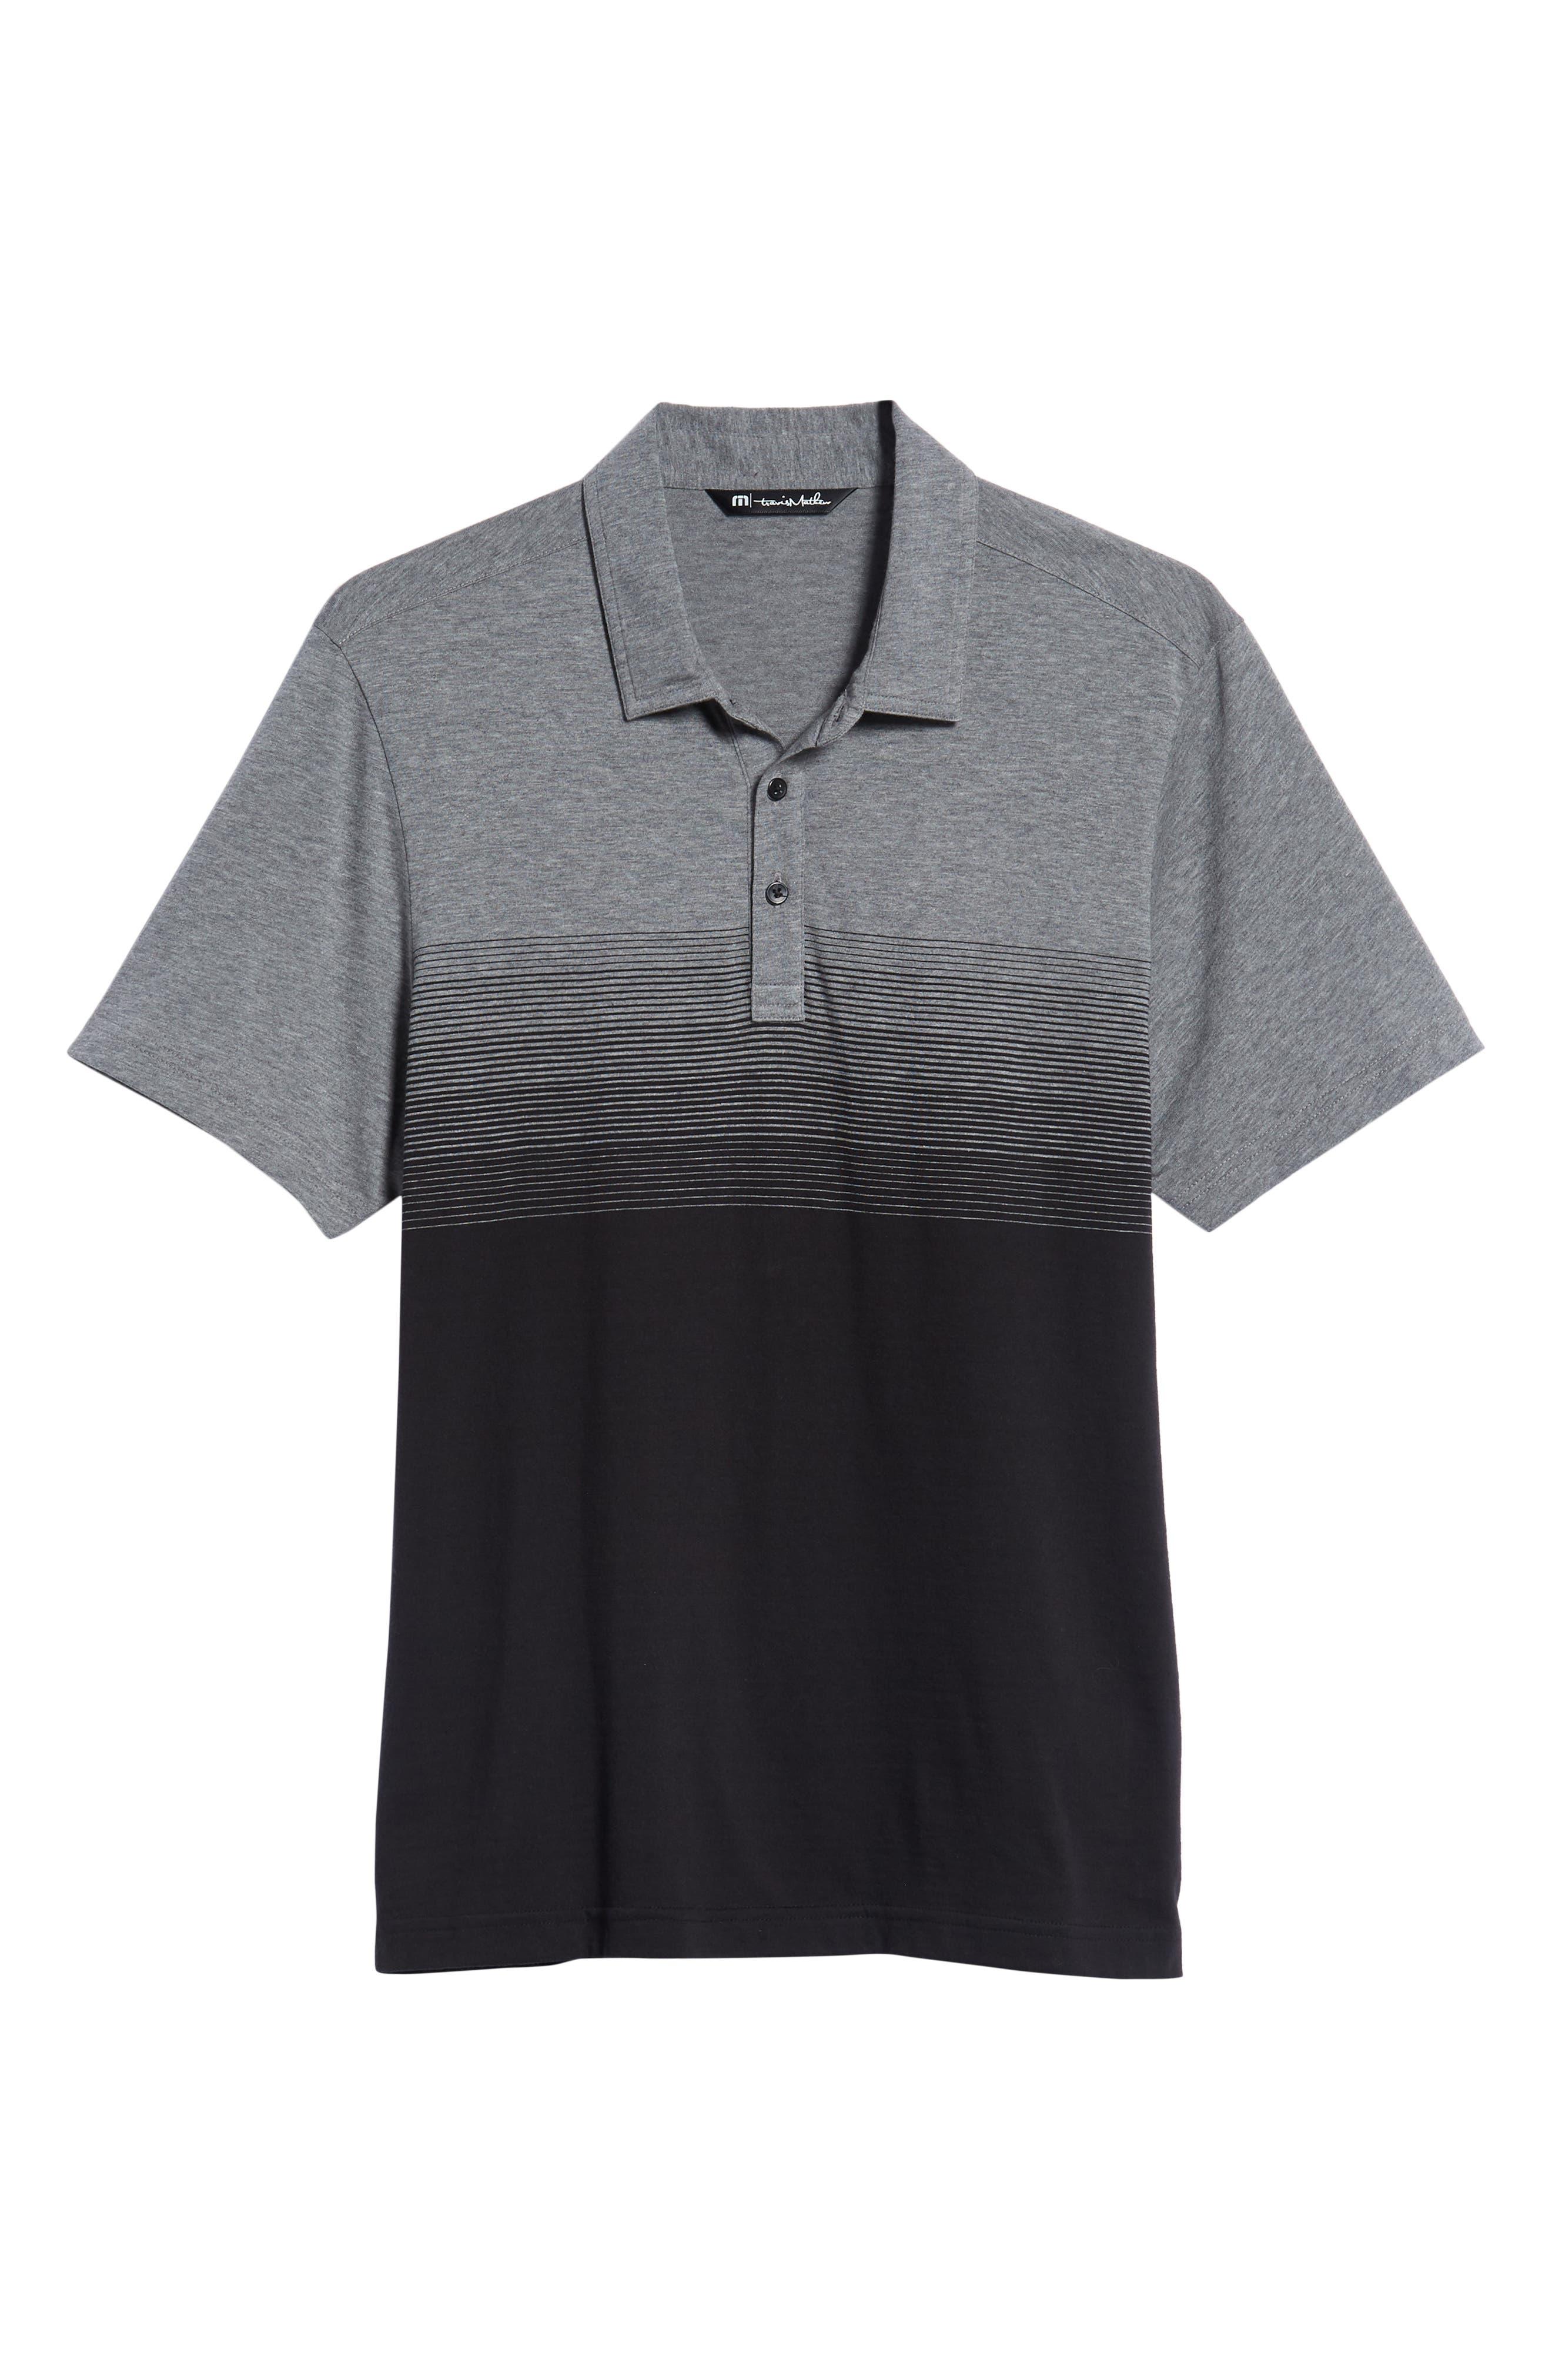 Smoothie Machine Short Sleeve Regular Fit Polo Shirt,                             Alternate thumbnail 6, color,                             BLACK